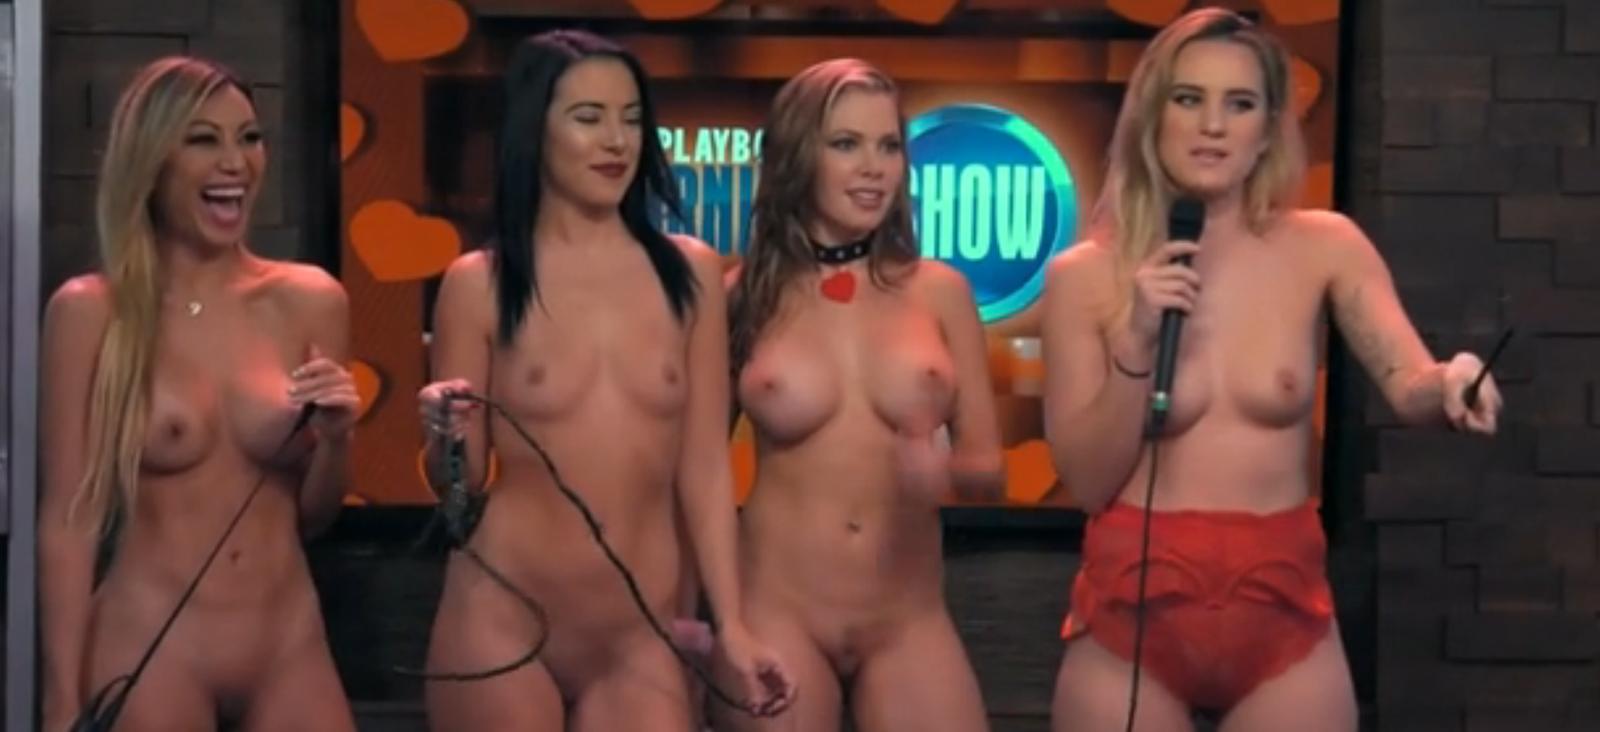 Survivor naked xxx exposed movie